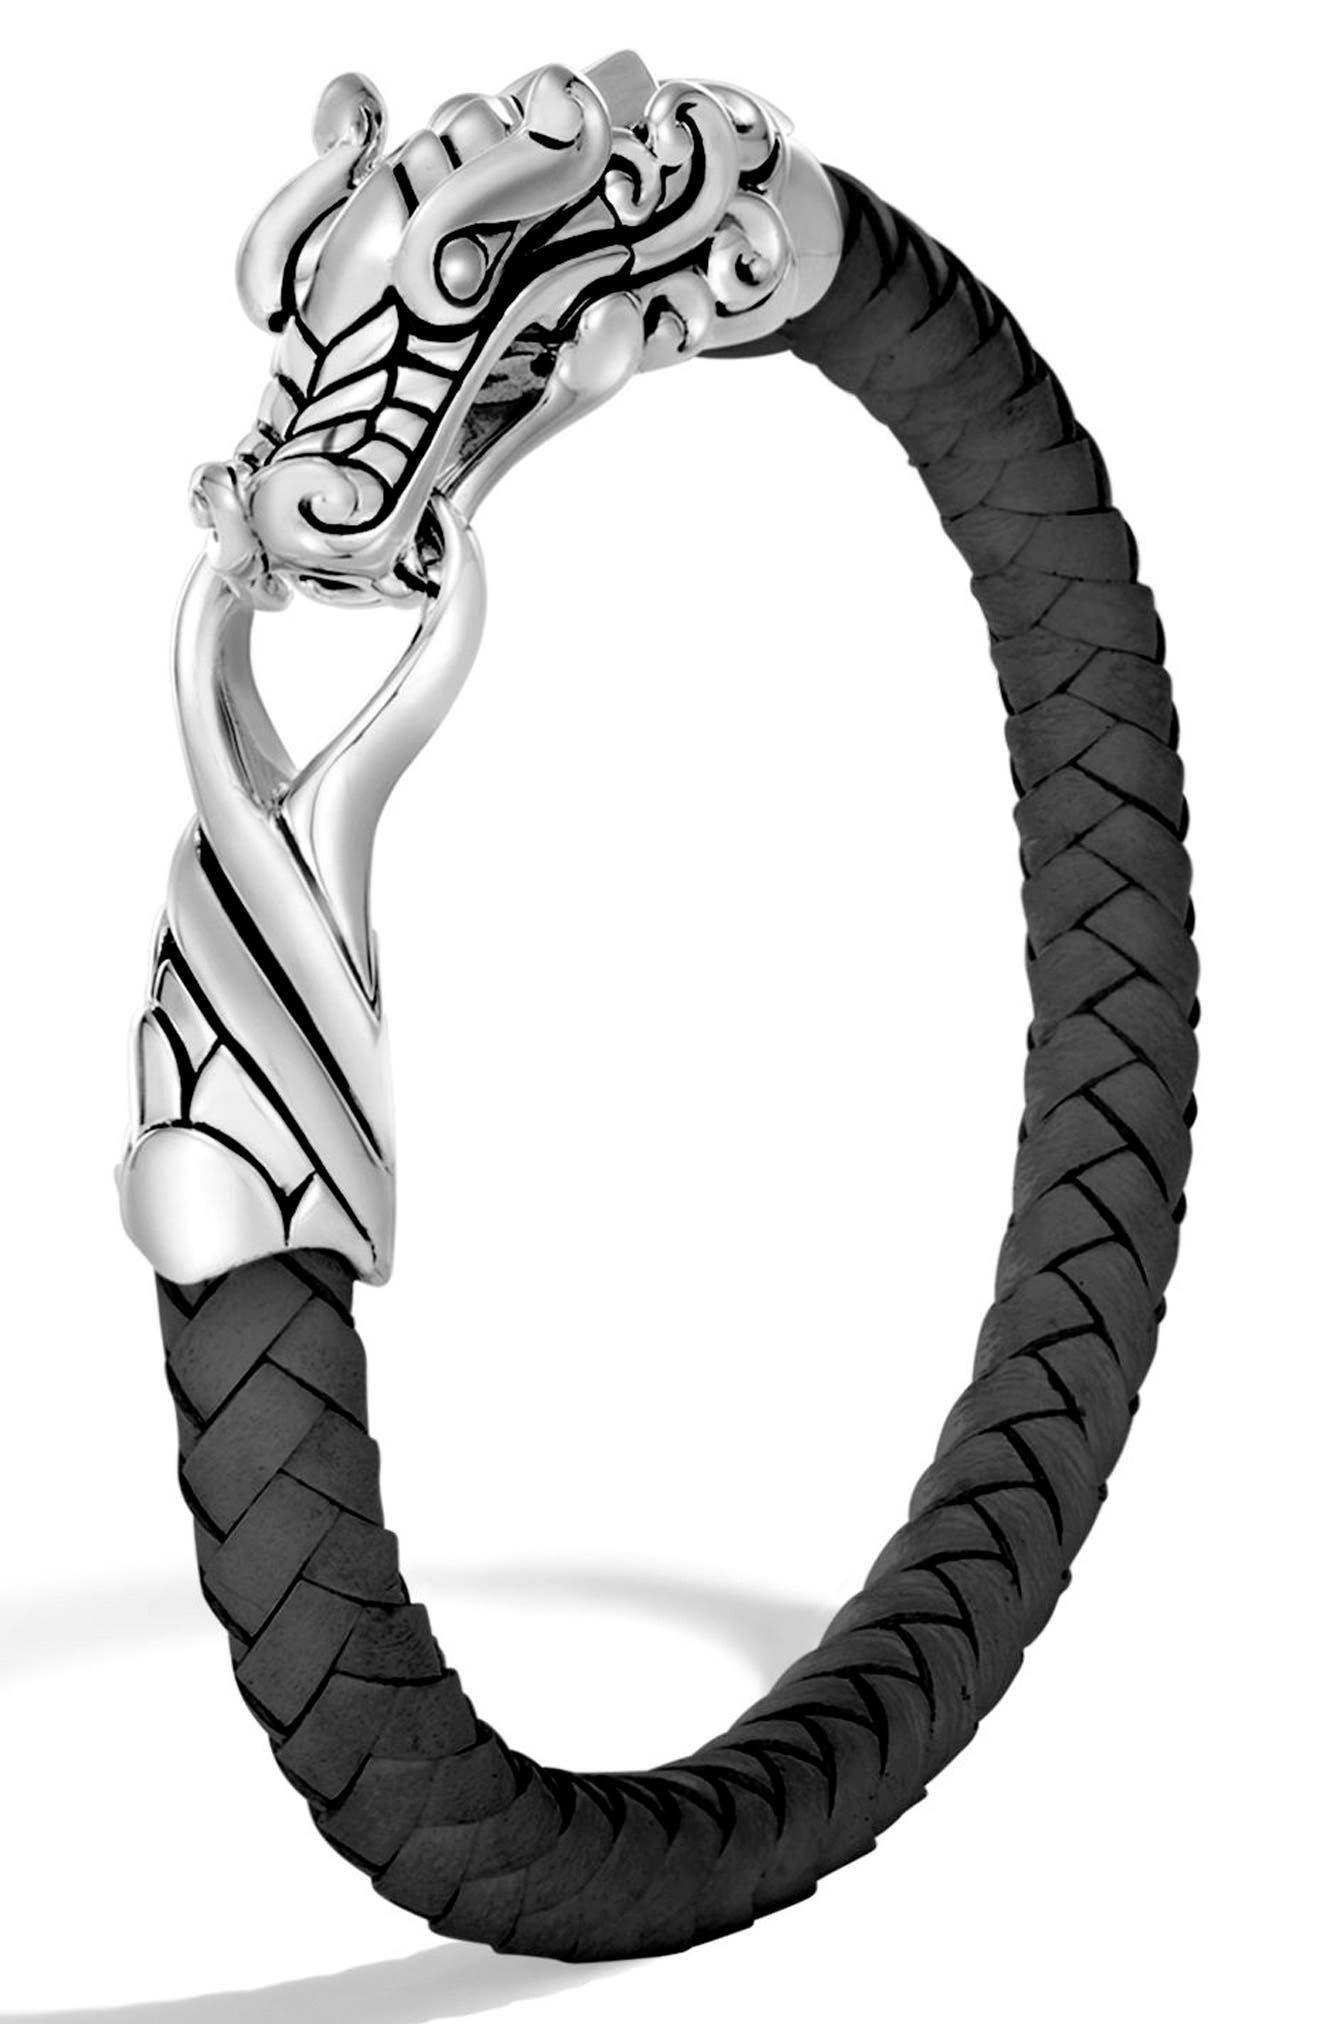 Legends Naga Braided Leather Bracelet,                             Main thumbnail 1, color,                             BLACK